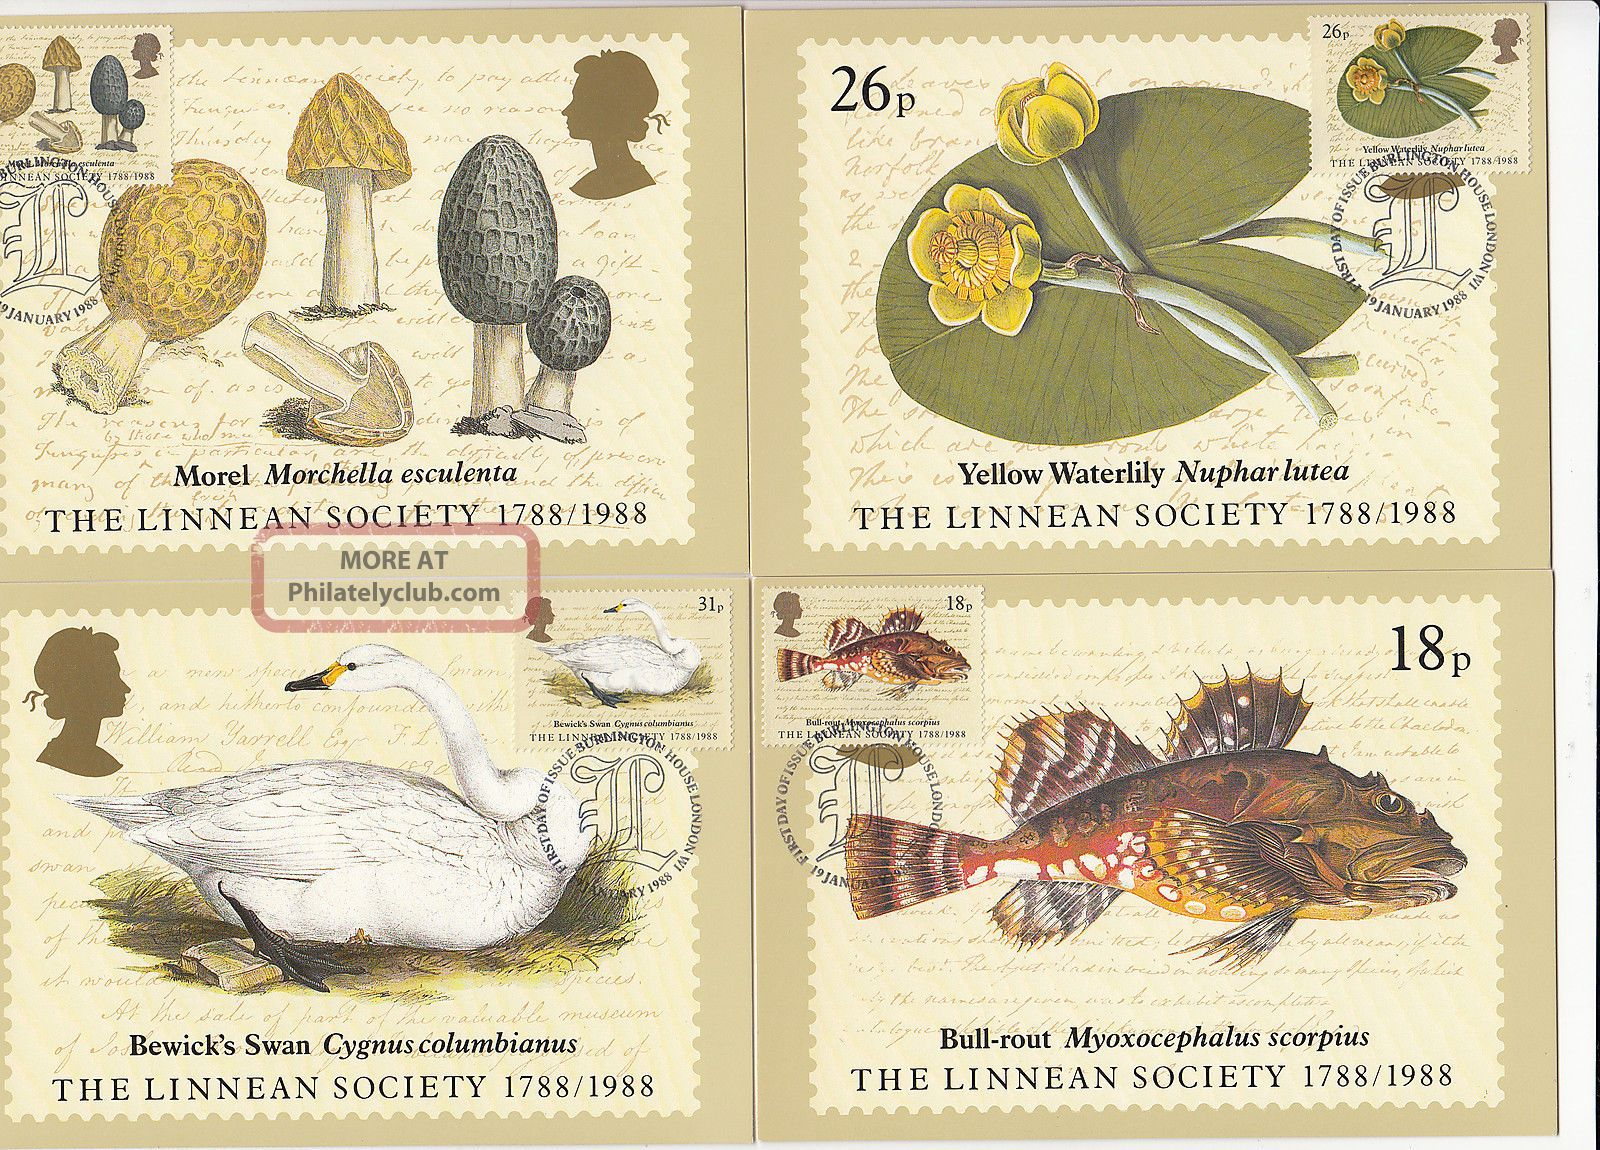 (32413) Gb Phq Fdi Linnean Society Maxicard / Postcard - Burlington 19 Jan 1988 1971-Now photo